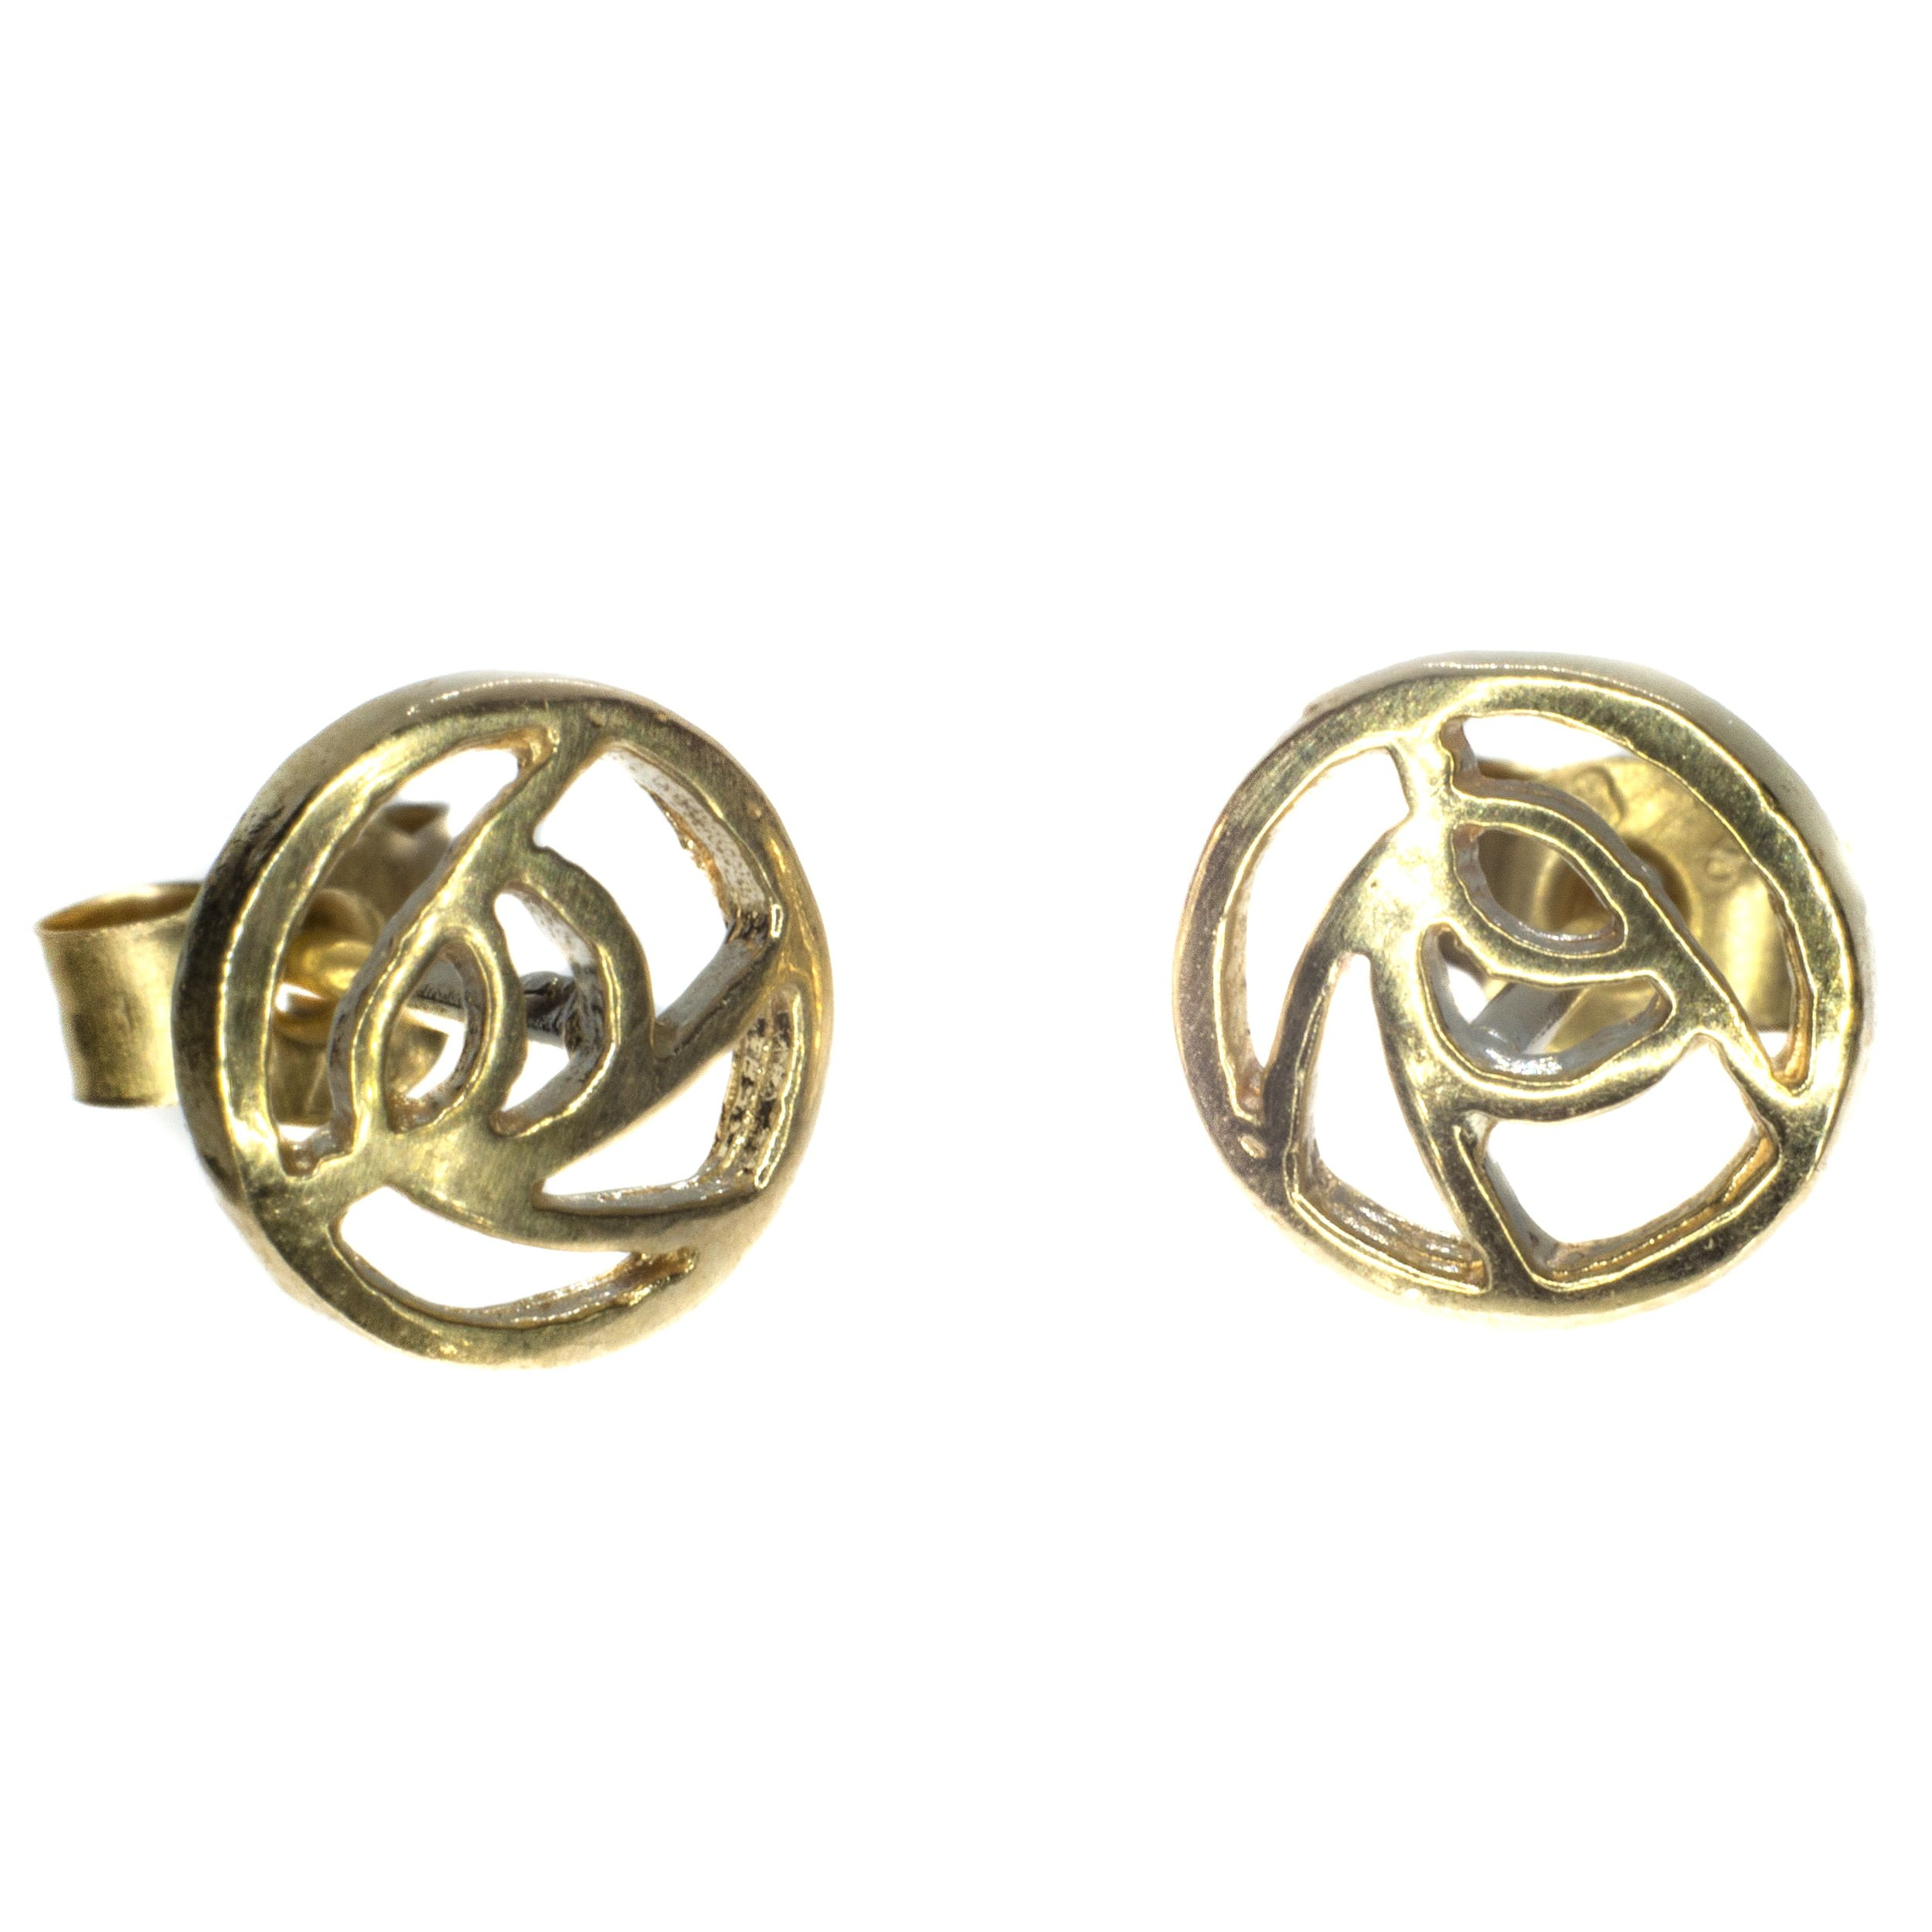 6mm Rennie Mackintosh gold stud earing 9ct yellow gold alt 2